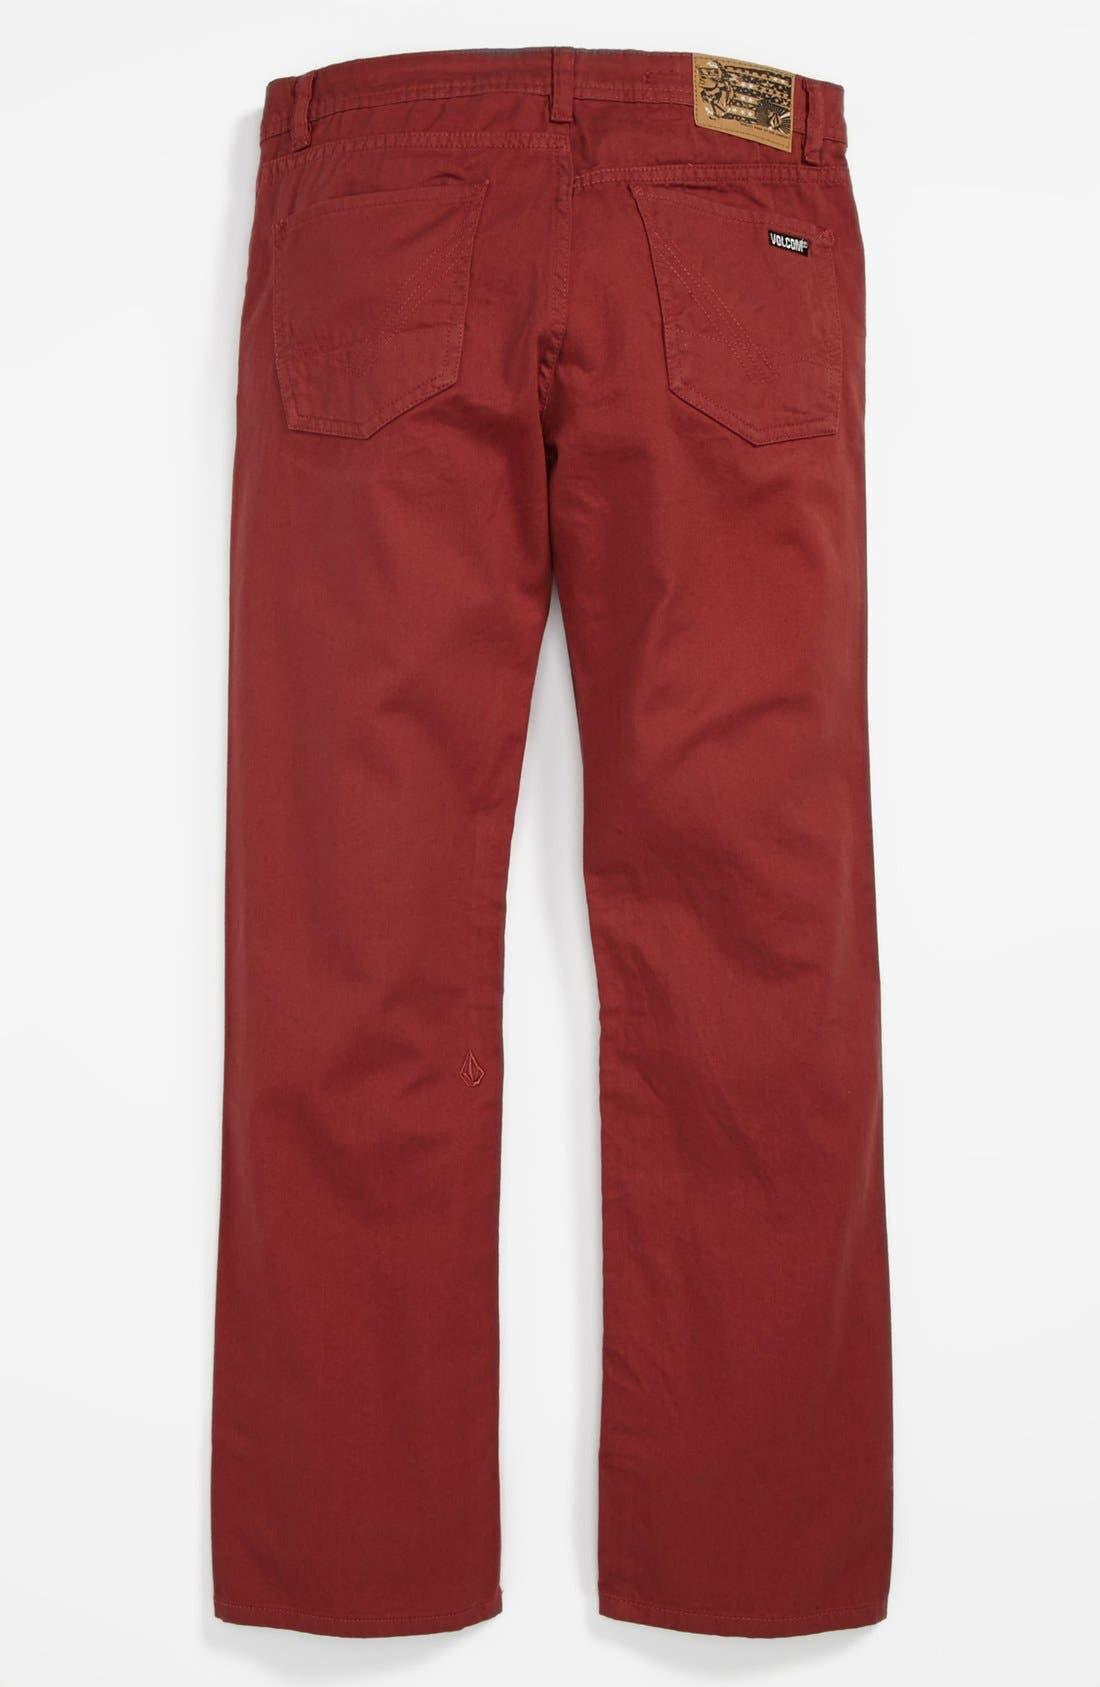 Alternate Image 1 Selected - Volcom 'Vorta' Twill Pants (Big Boys)